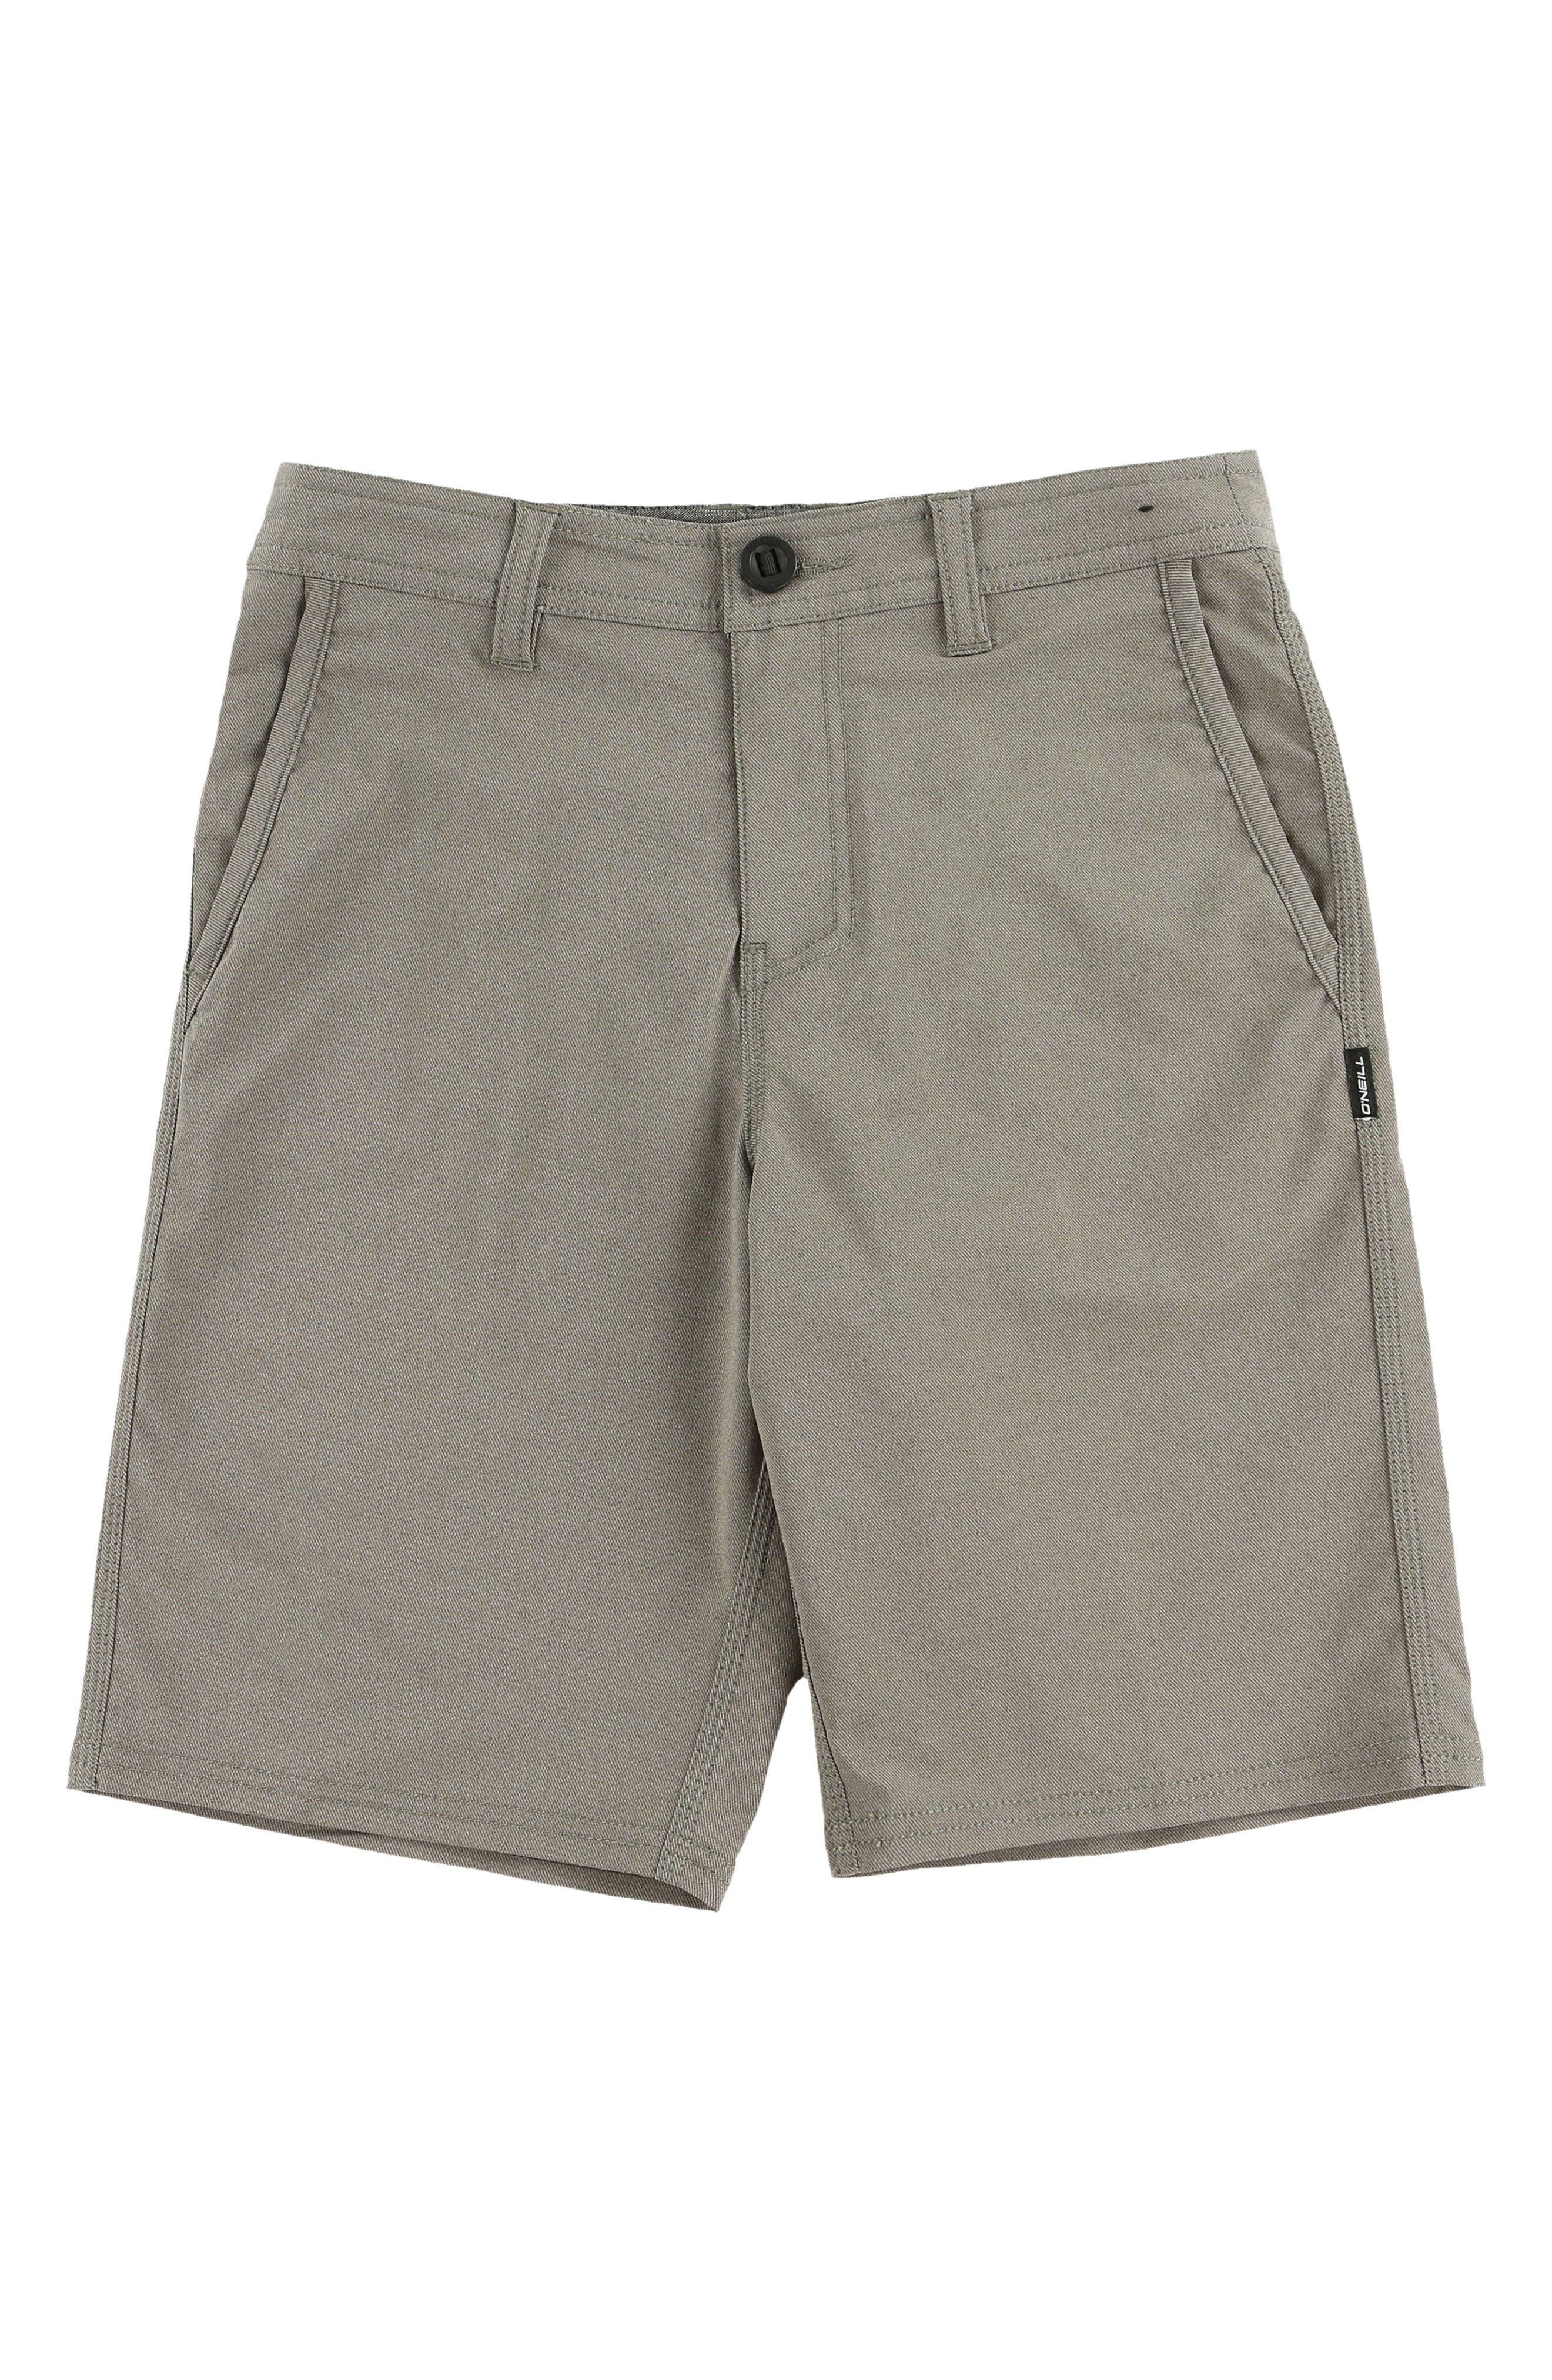 Stockton Hybrid Shorts,                             Main thumbnail 1, color,                             COFFEE